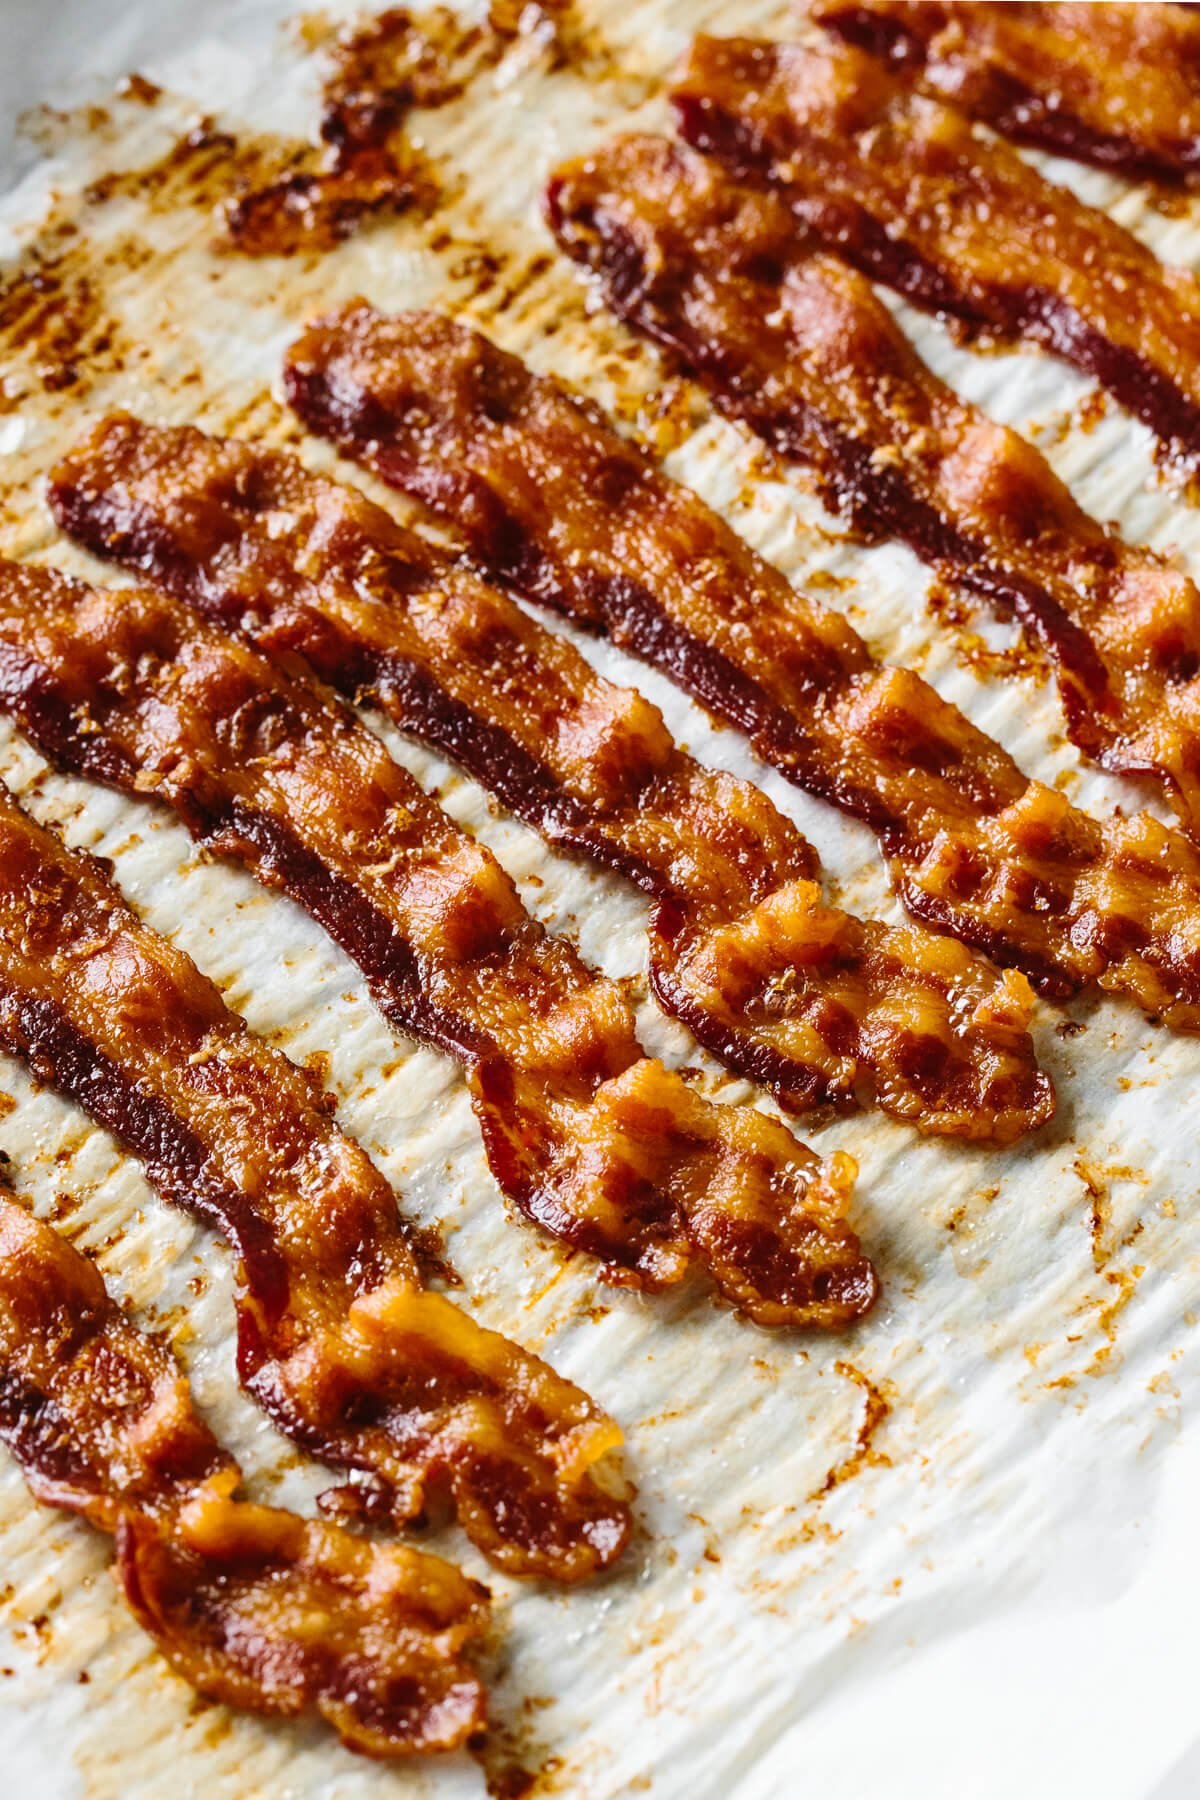 Crispy oven baked bacon on a sheet tray.